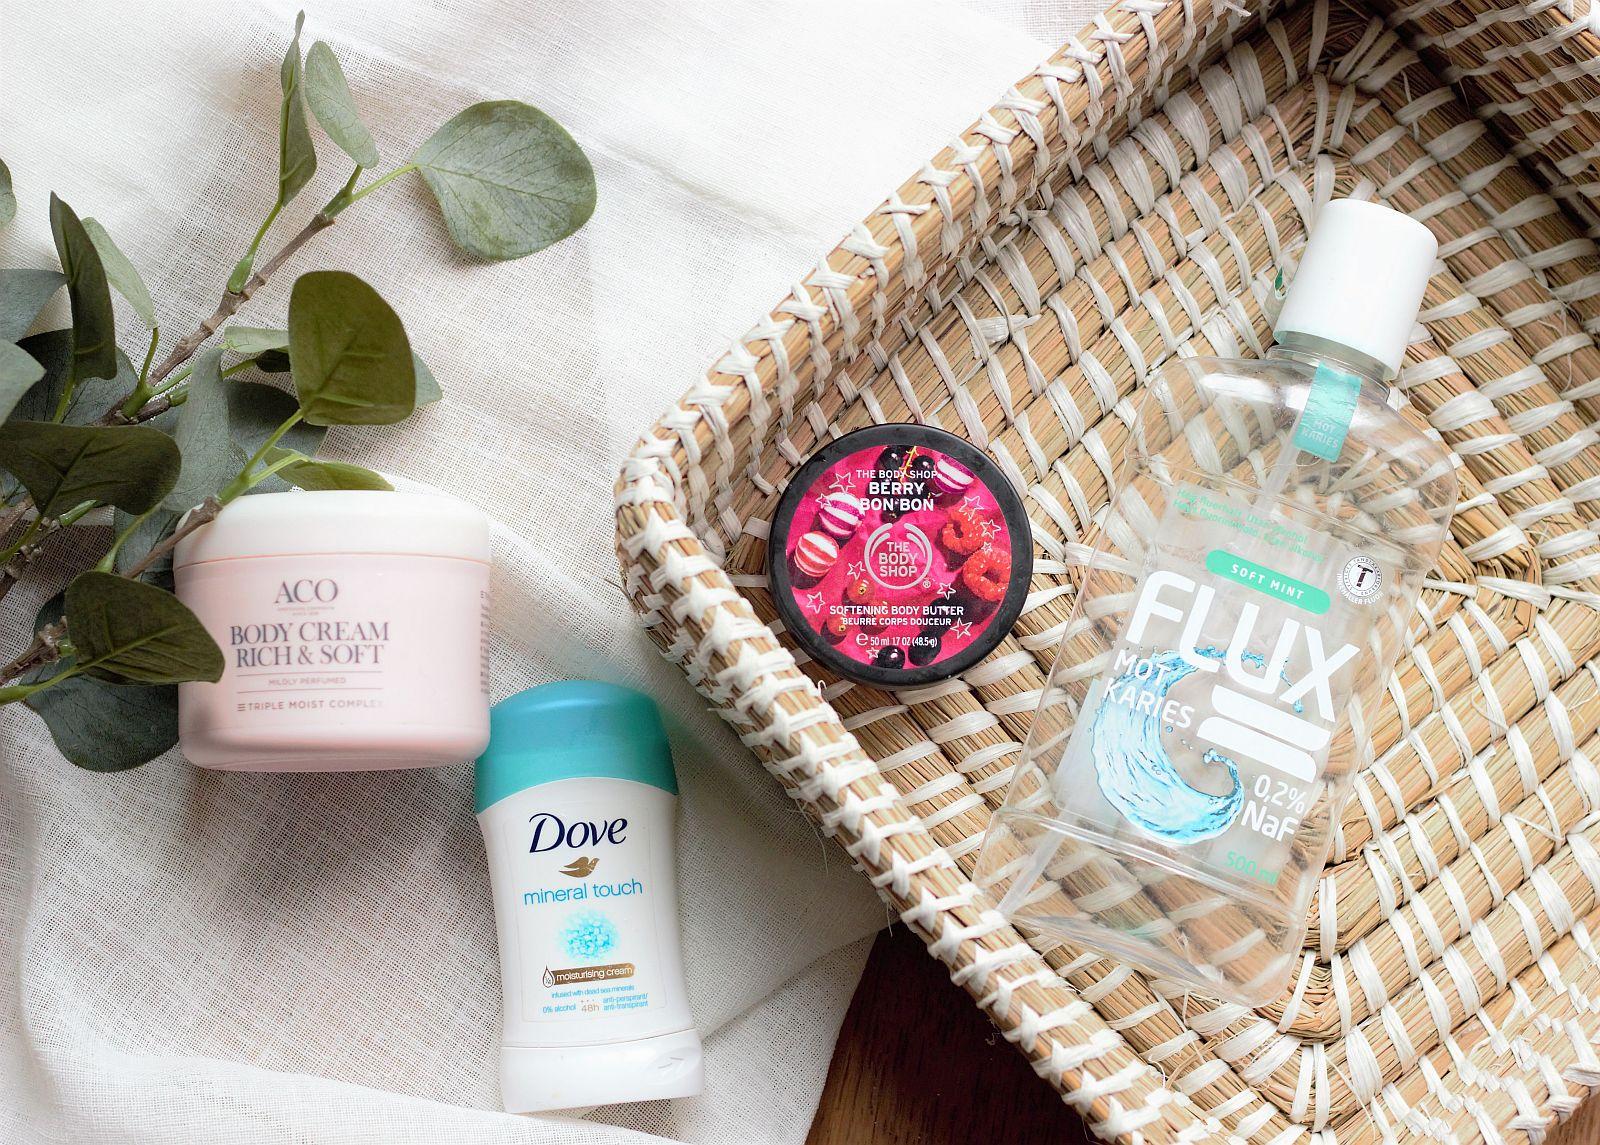 Зъбна хигиена и тяло - Dove, FLUX, ACO, The Body Shop